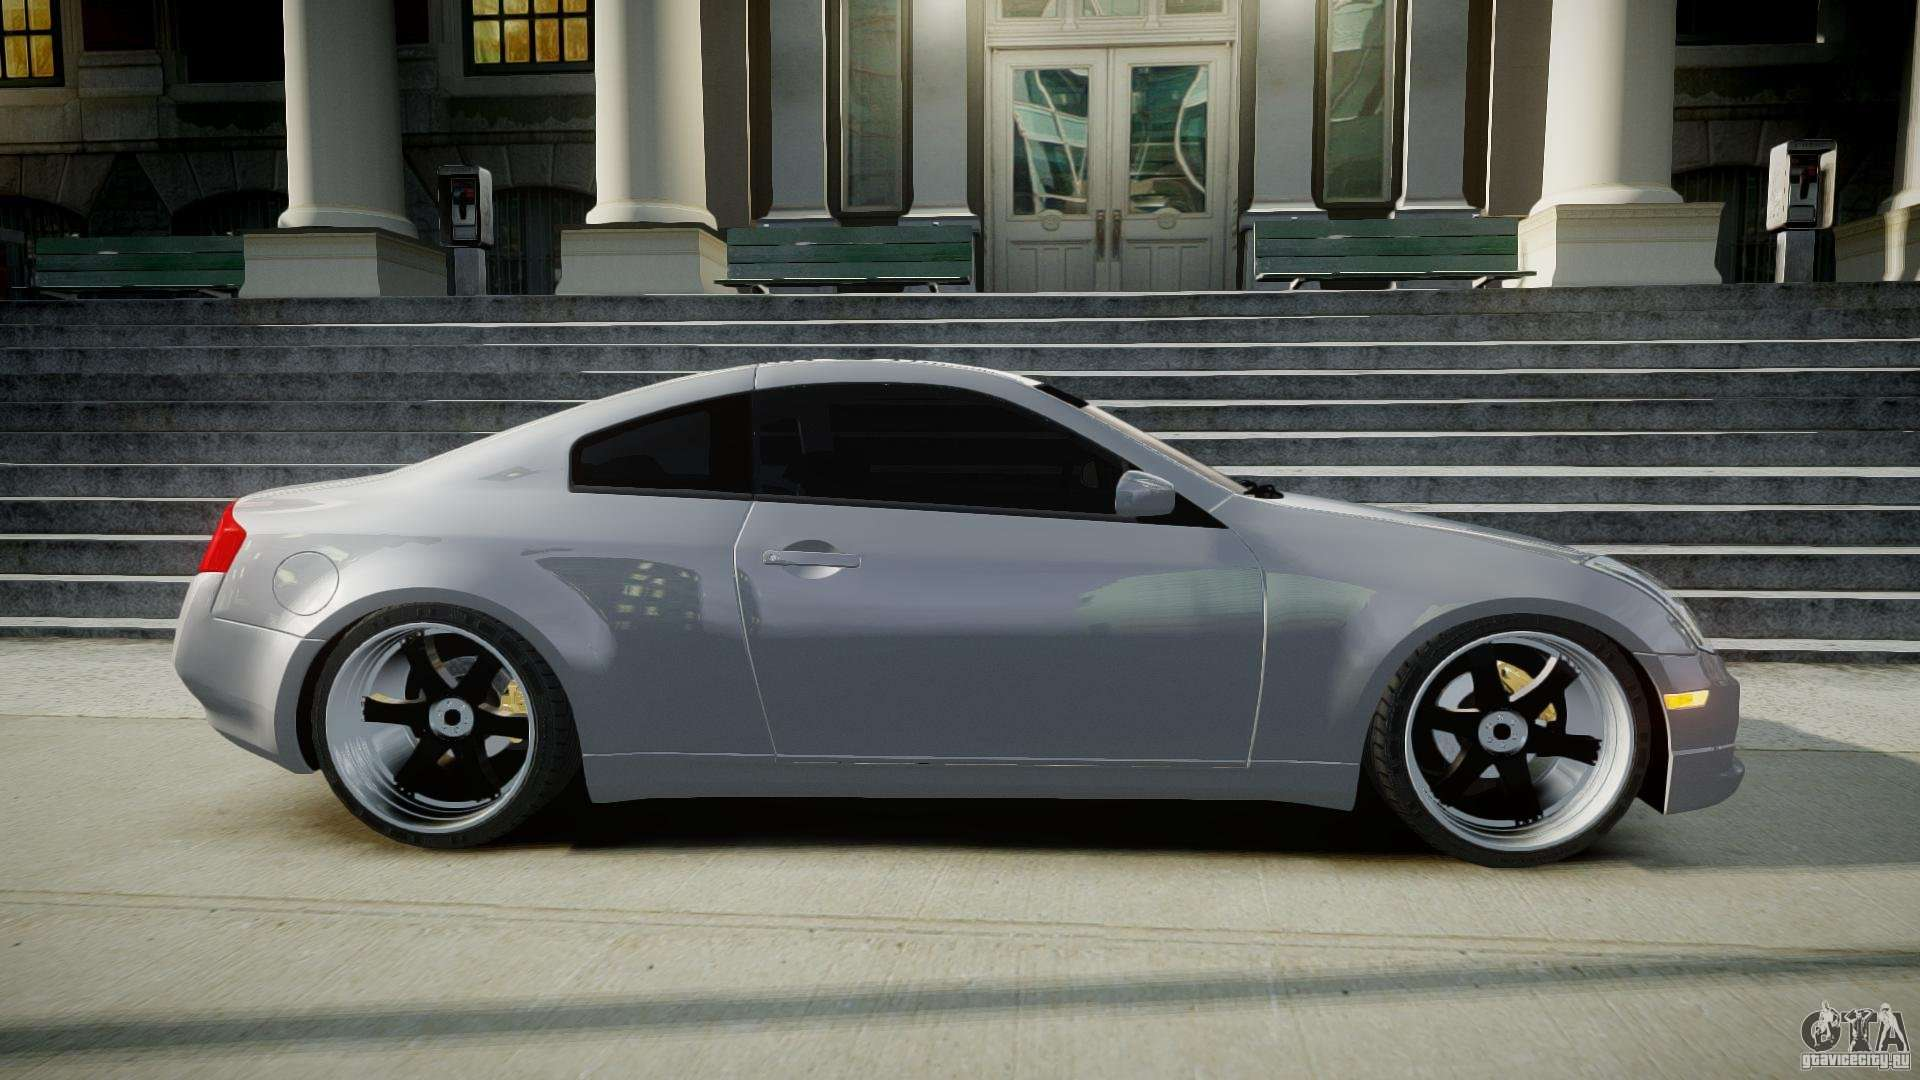 Infiniti g35 coupe 2003 jdm tune for gta 4 infiniti g35 coupe 2003 jdm tune for gta 4 side view vanachro Image collections